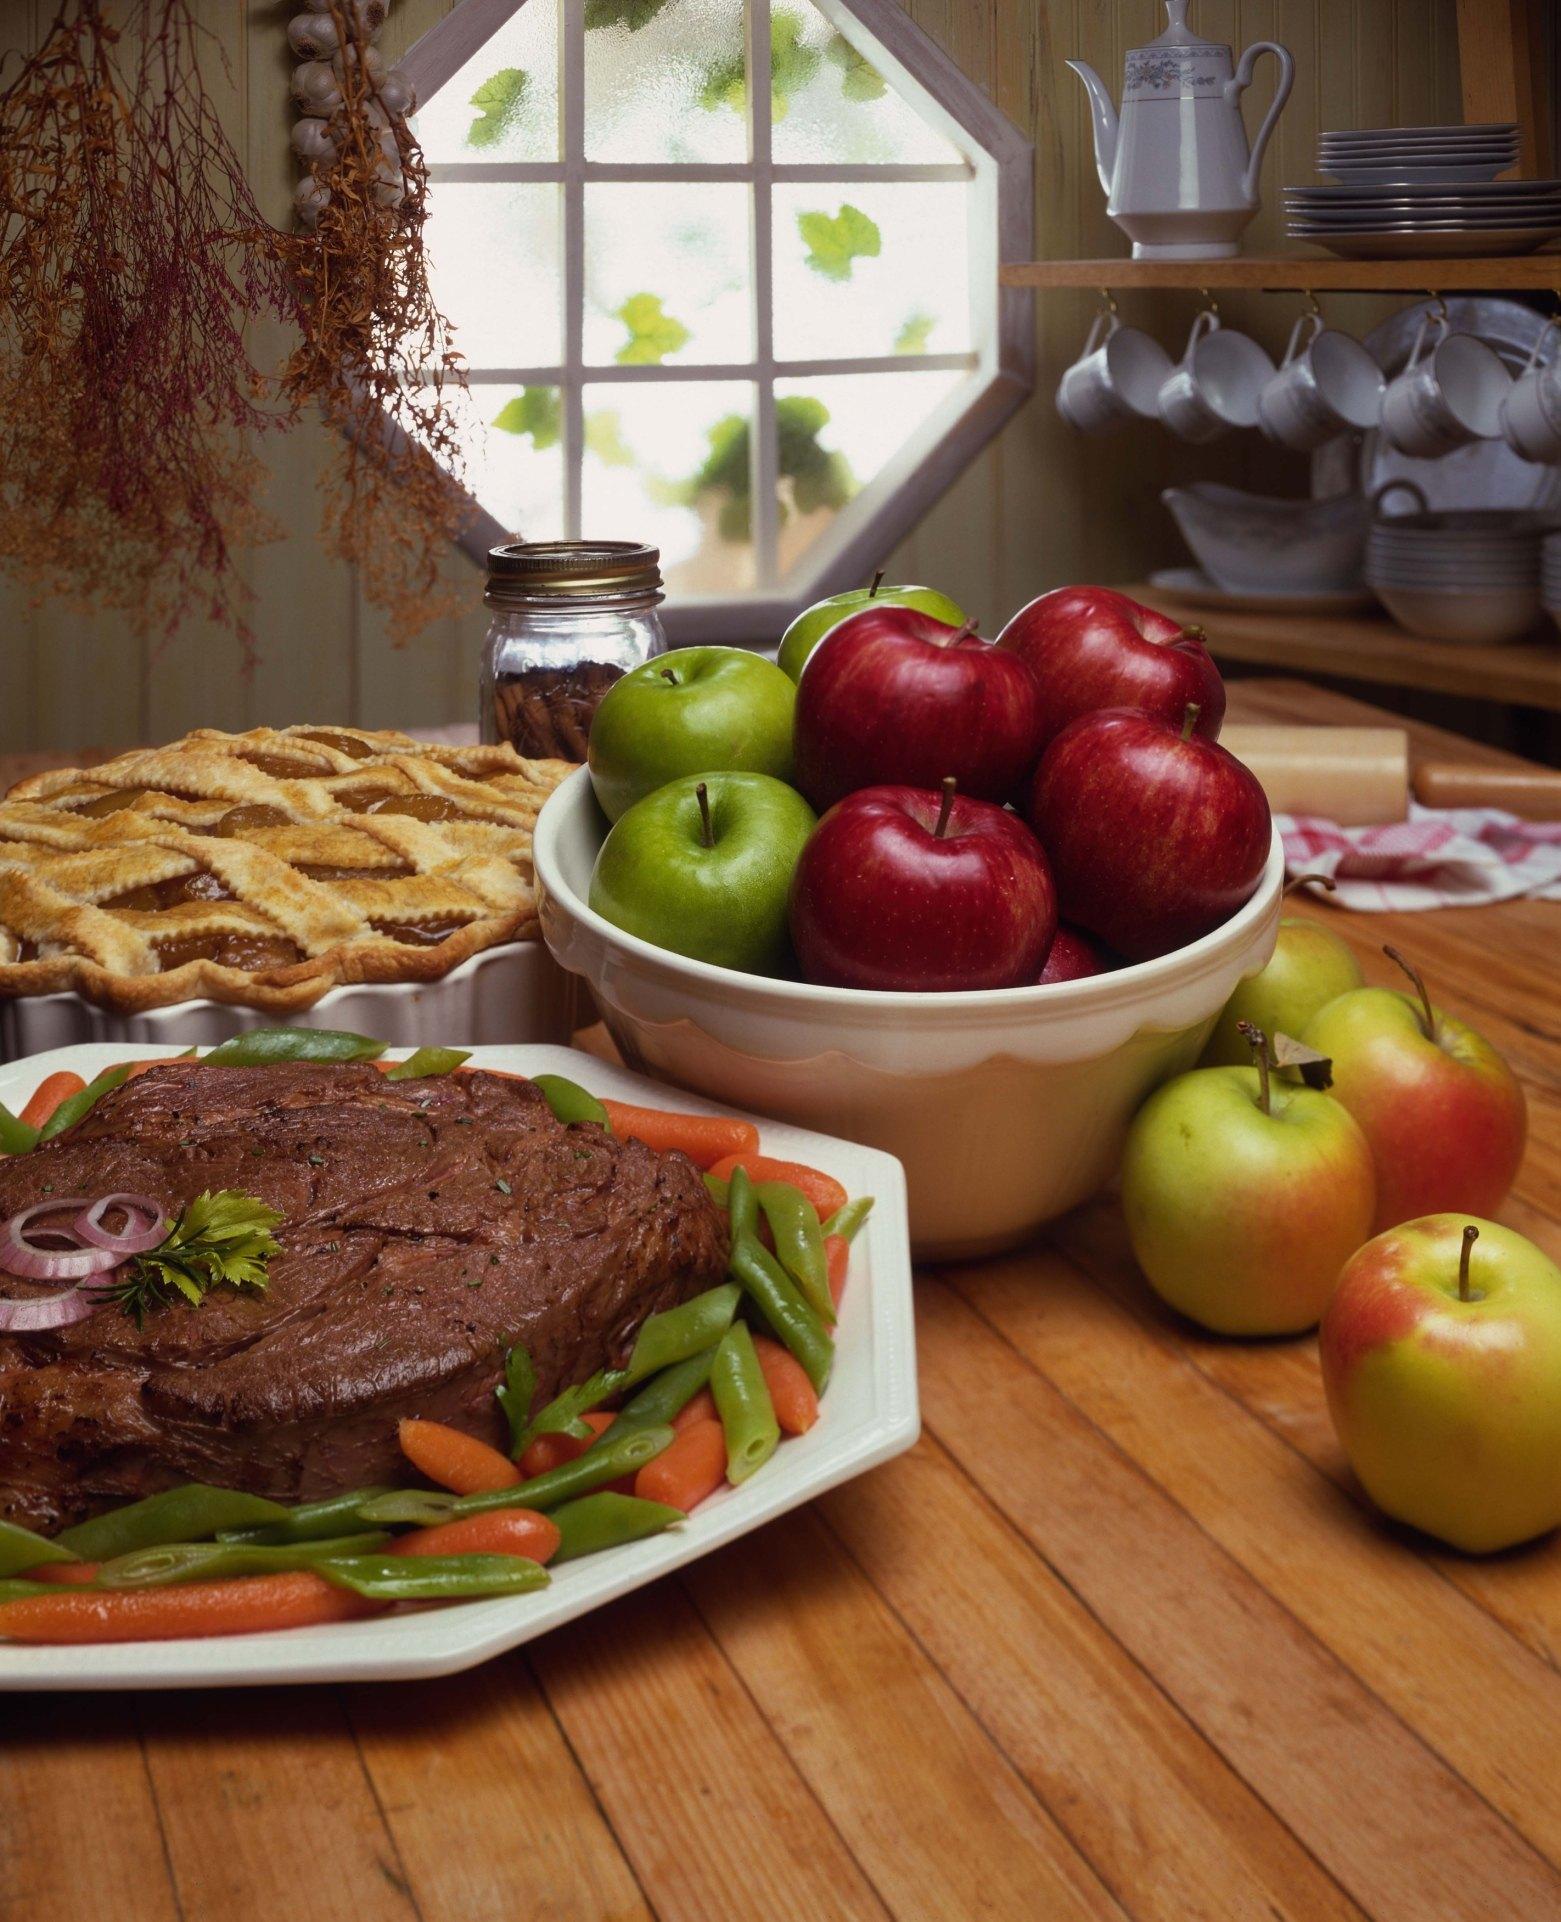 How To Cook Boneless Loin New York Strip Roast Ehow